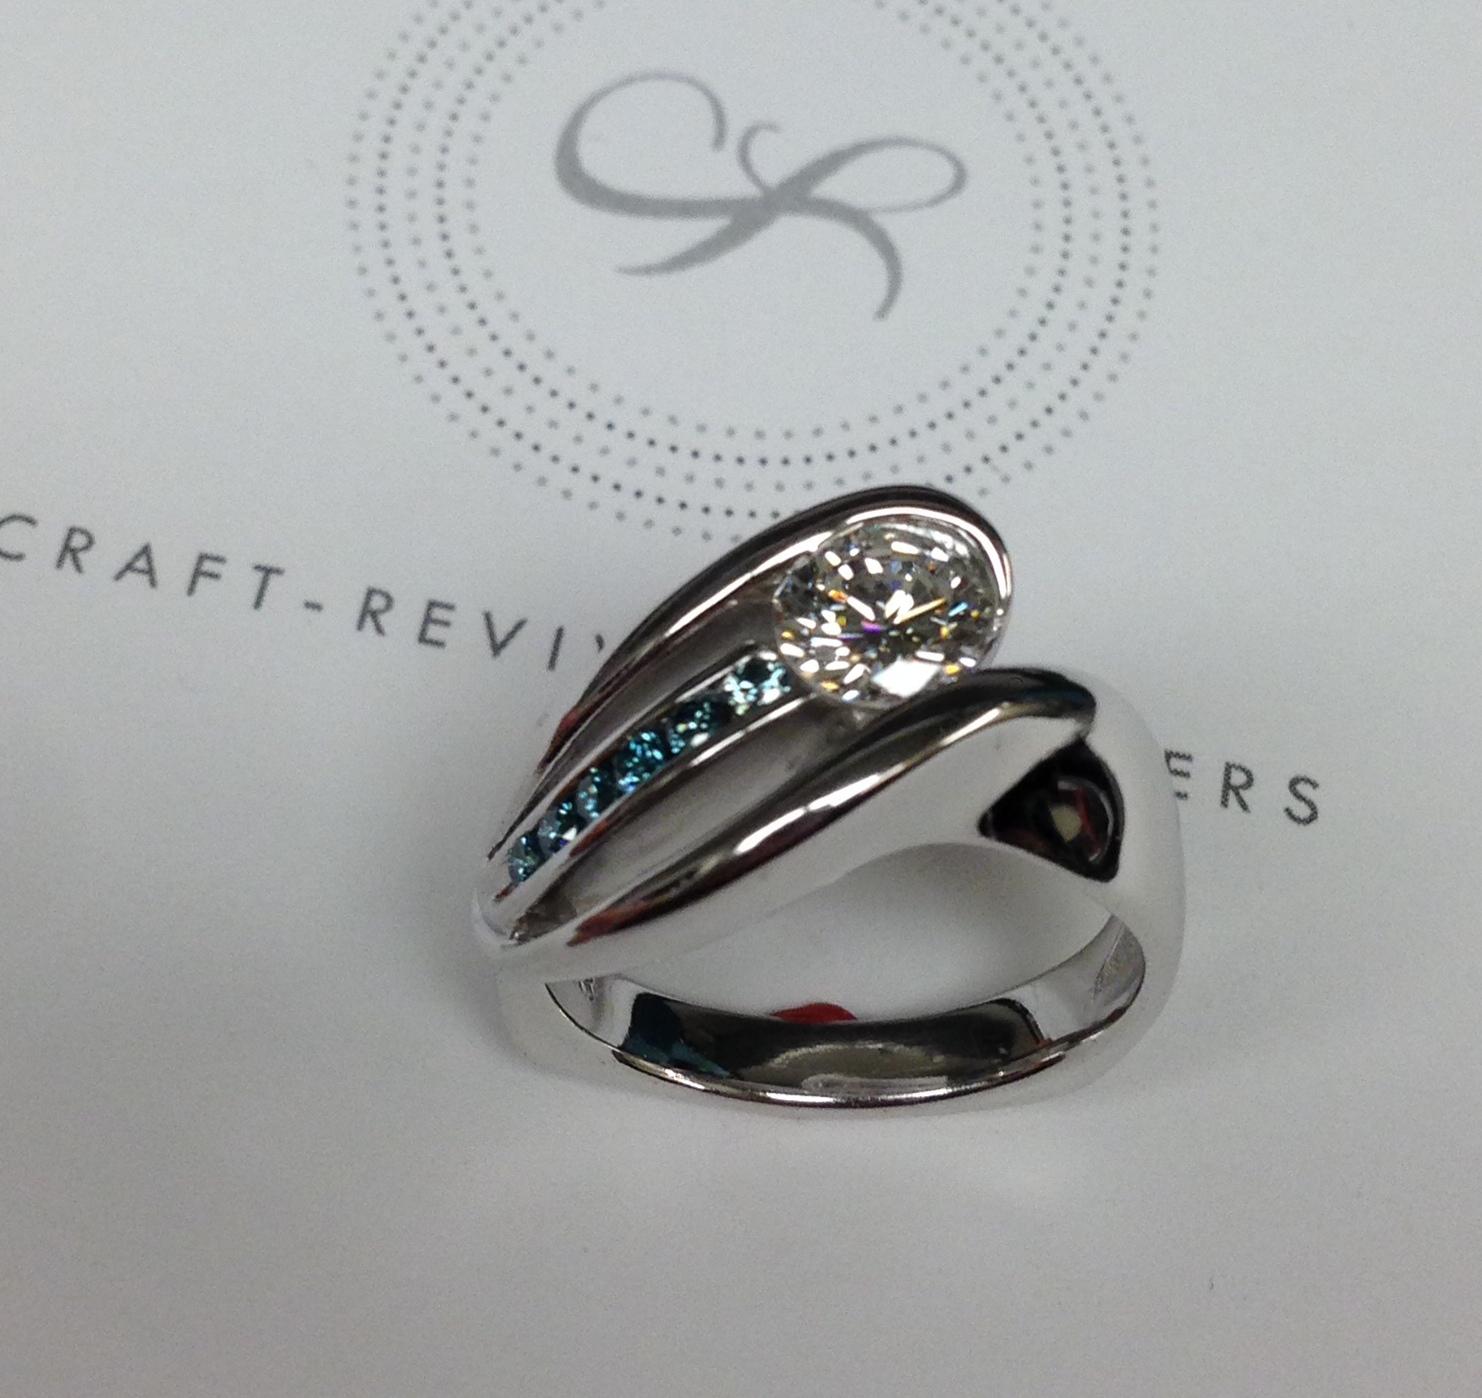 unique-custom-roud-diamond-blue-diamonds-modern-design-white-gold-engagement-ring-craft-revival-jewelry-store-grand-rapids